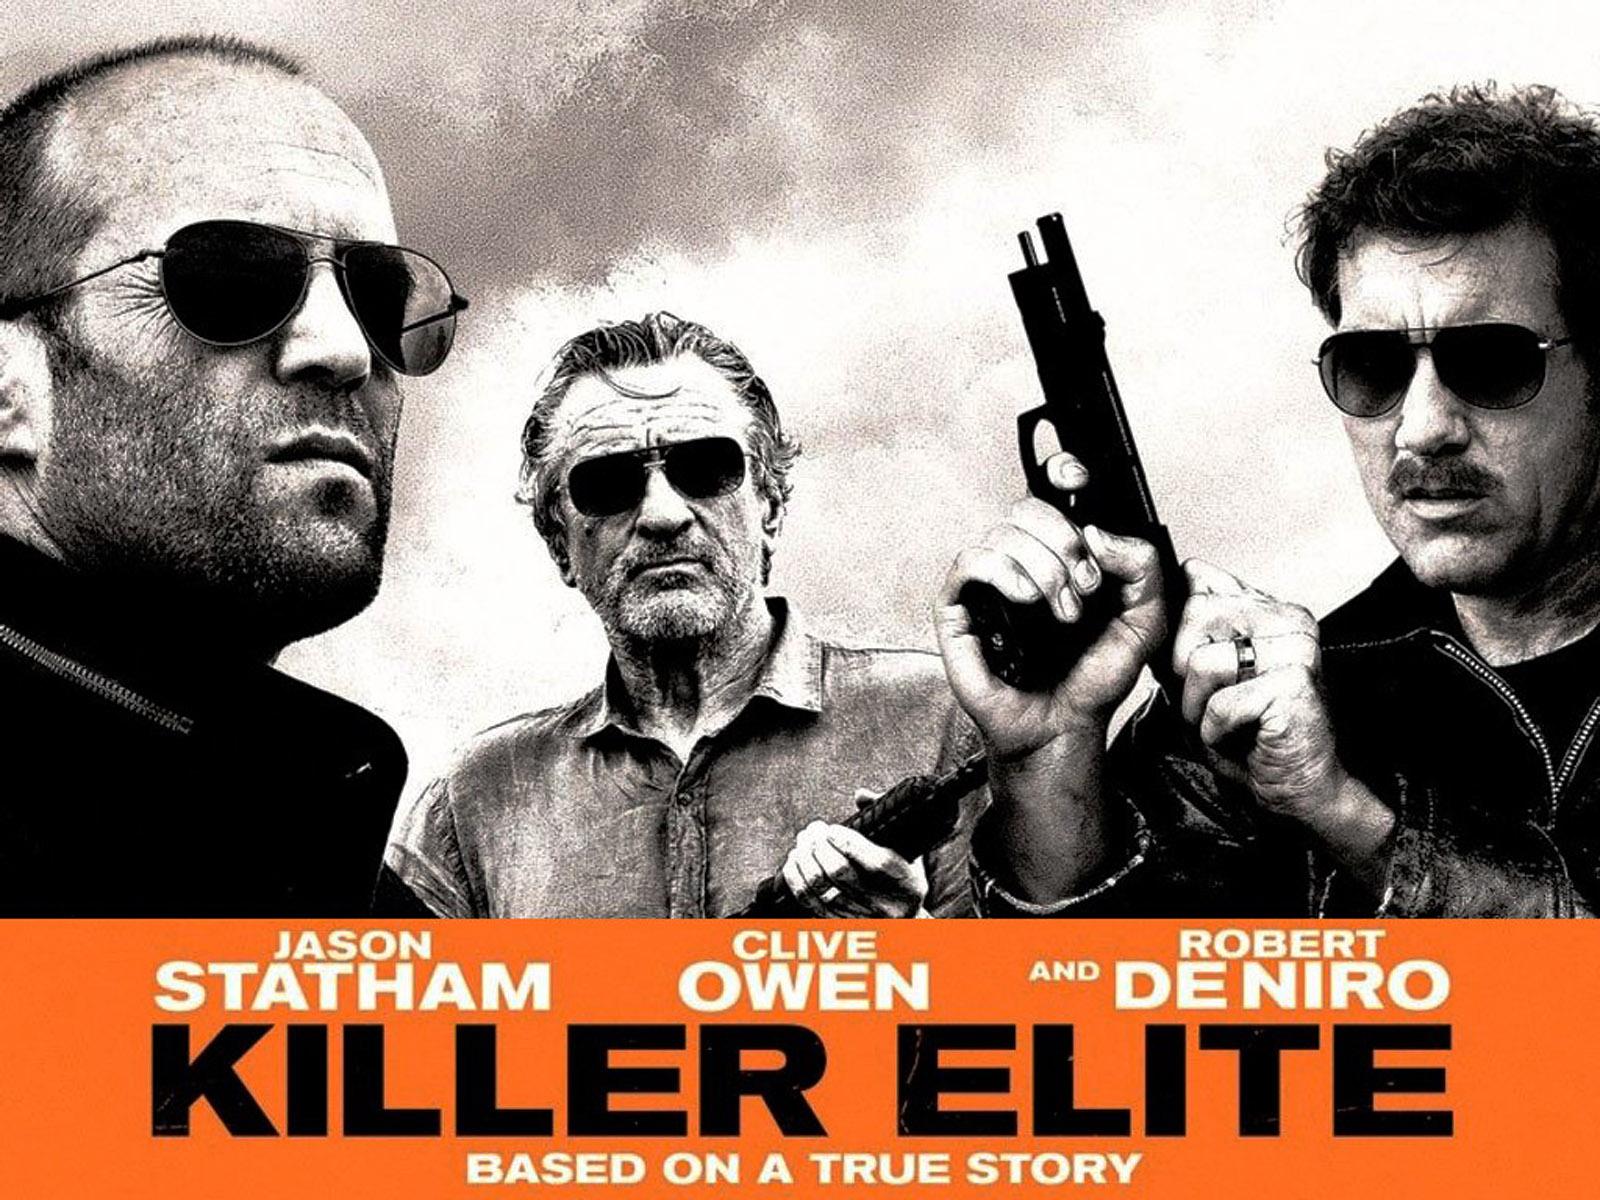 http://3.bp.blogspot.com/-5BukCovUt6U/Tneo54H5VoI/AAAAAAAADKc/GZppoxB4OrA/s1600/Killer_Elite_Jason_Statham_Clive_Owen_HD_Poster_Vvallpaper.Net.jpg